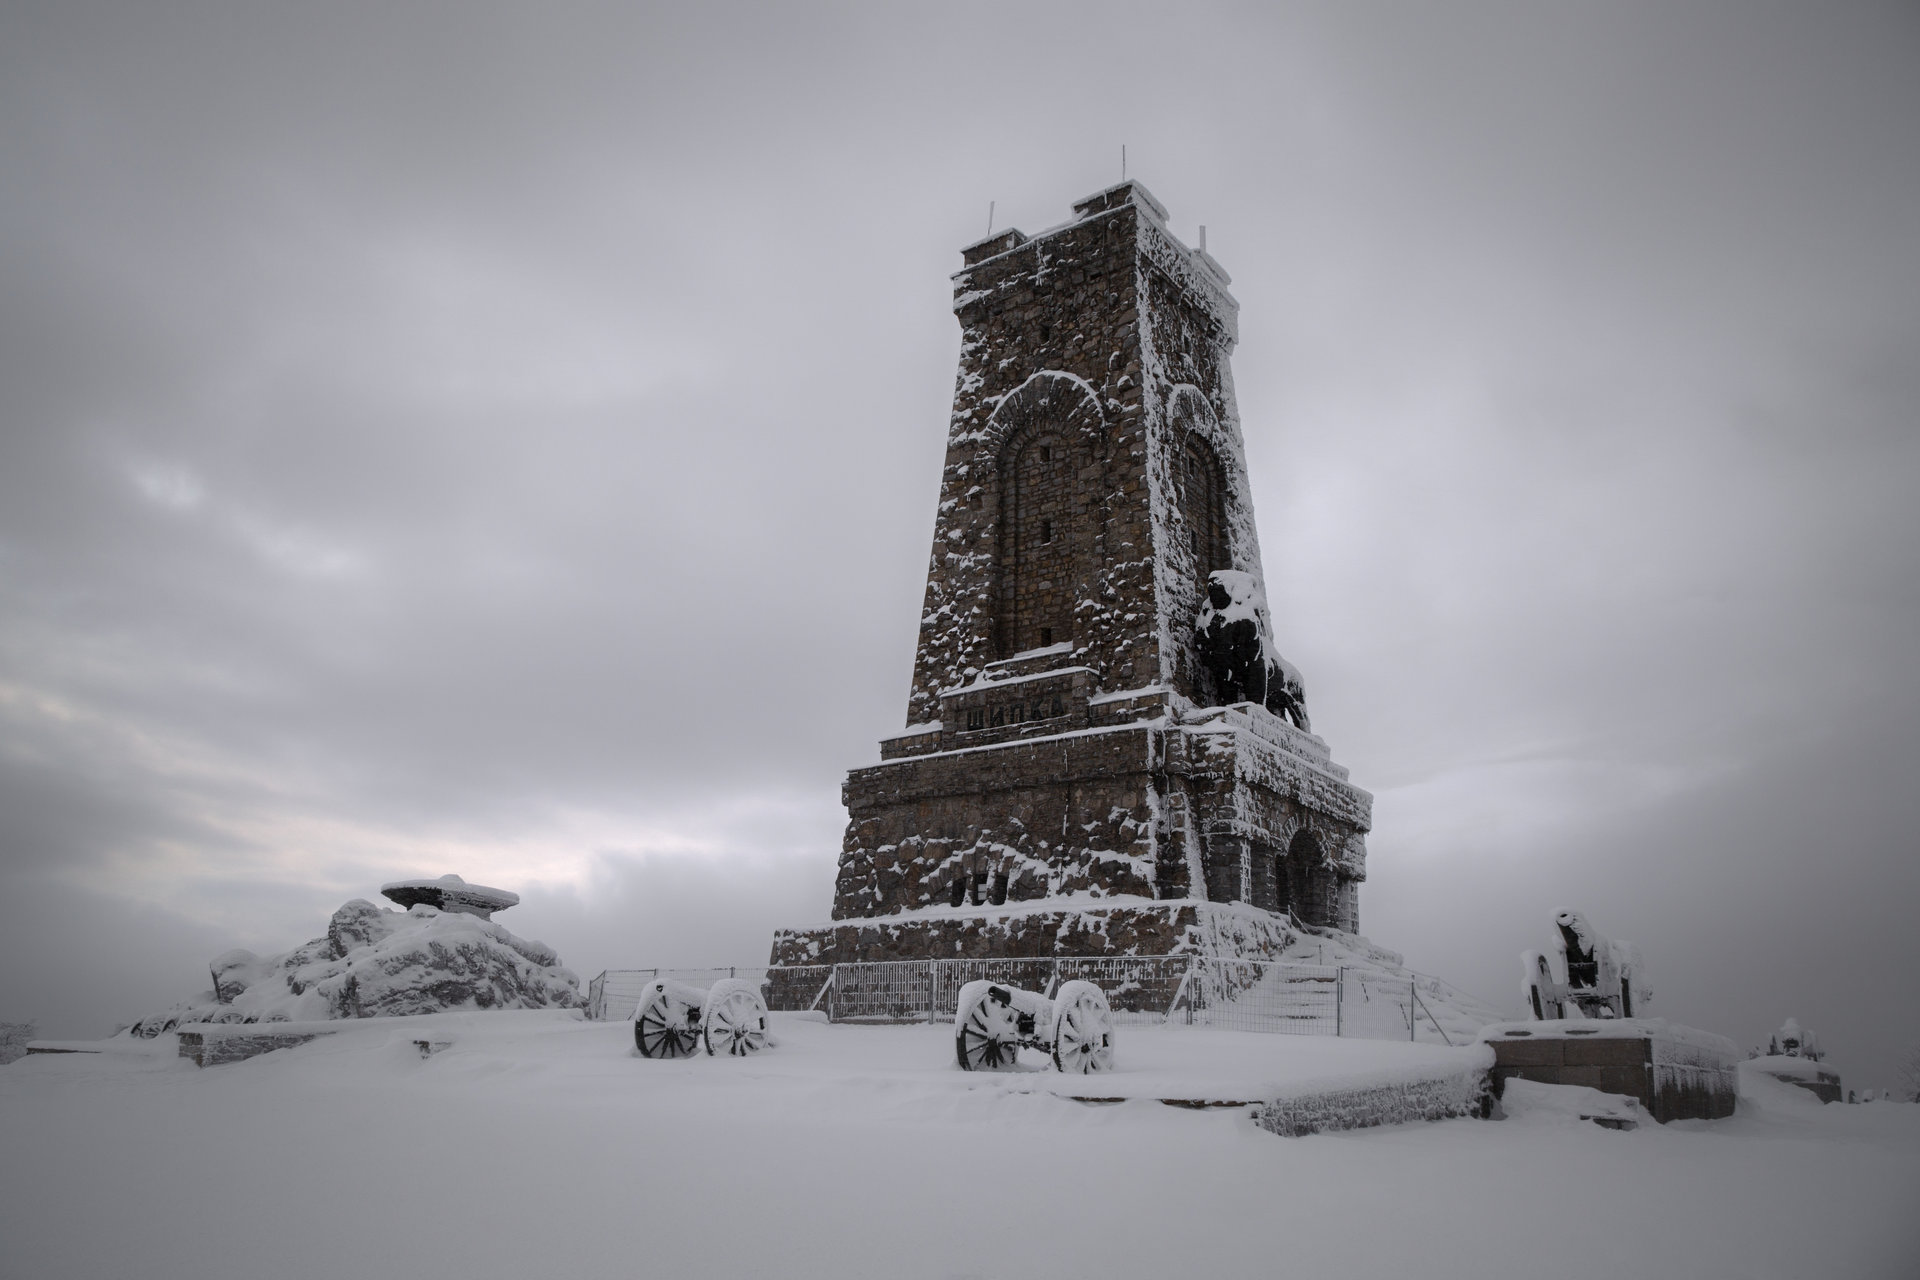 Шипка монумент | Author Tsanko Darakchiev - The_Moon | PHOTO FORUM